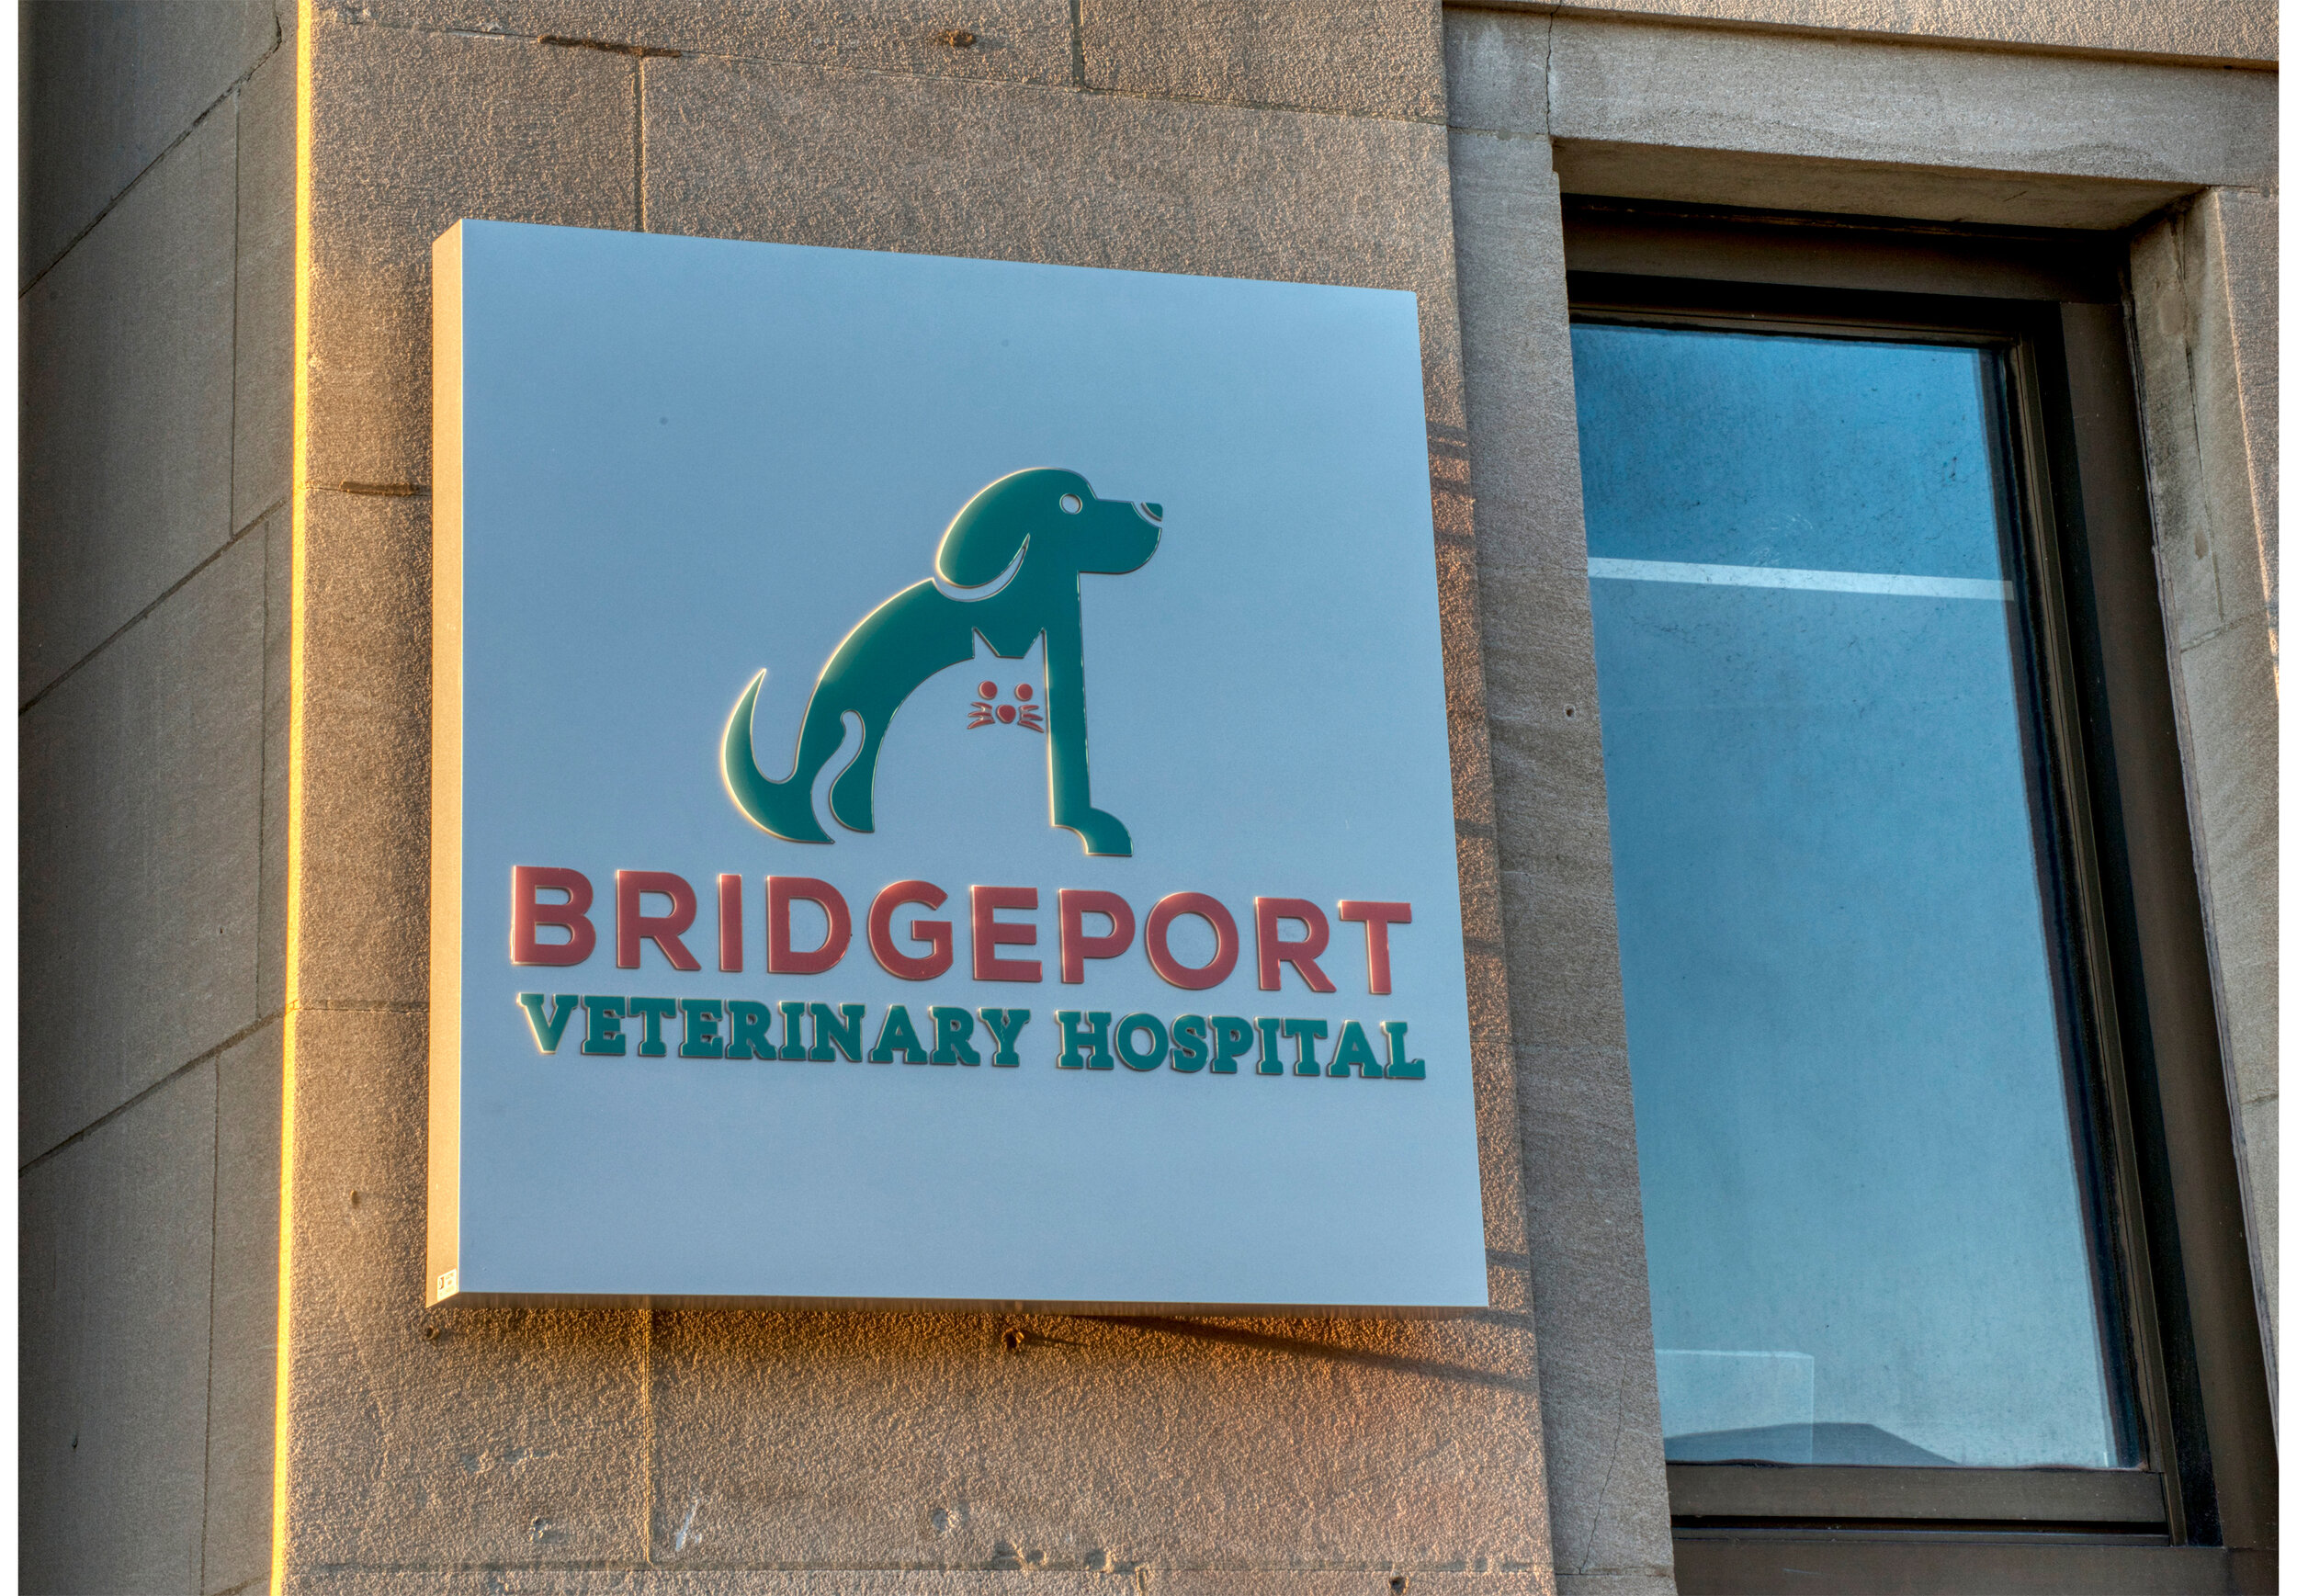 BridgeportVeterinaryHospital_ExteriorSignage.jpg